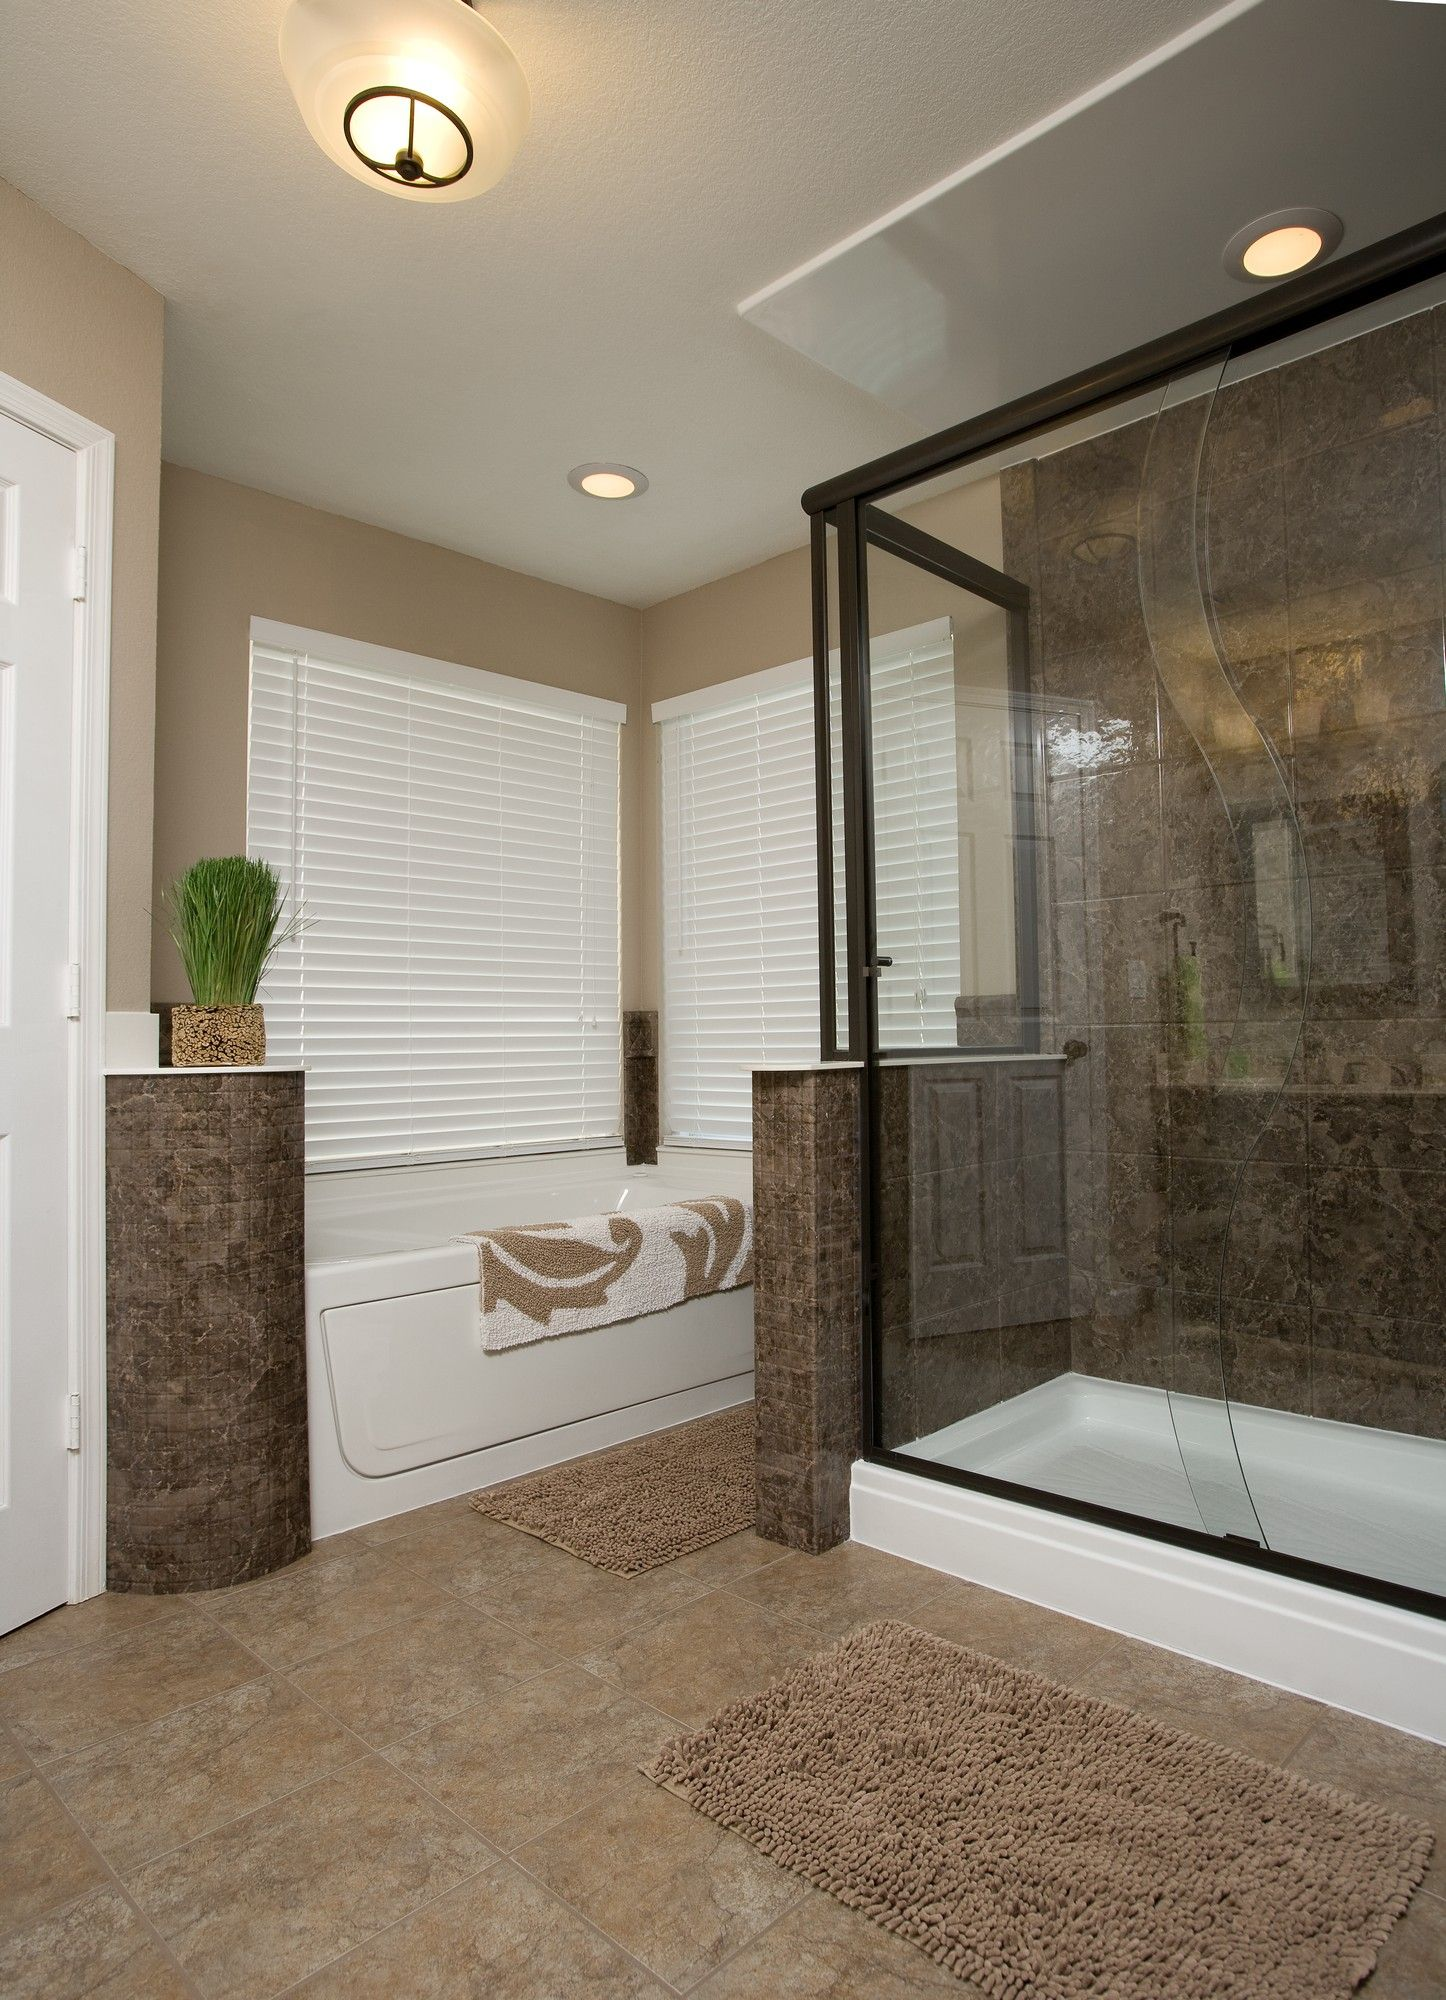 Re-Bath shower base and bathtub, featuring Mocha wall surround ...